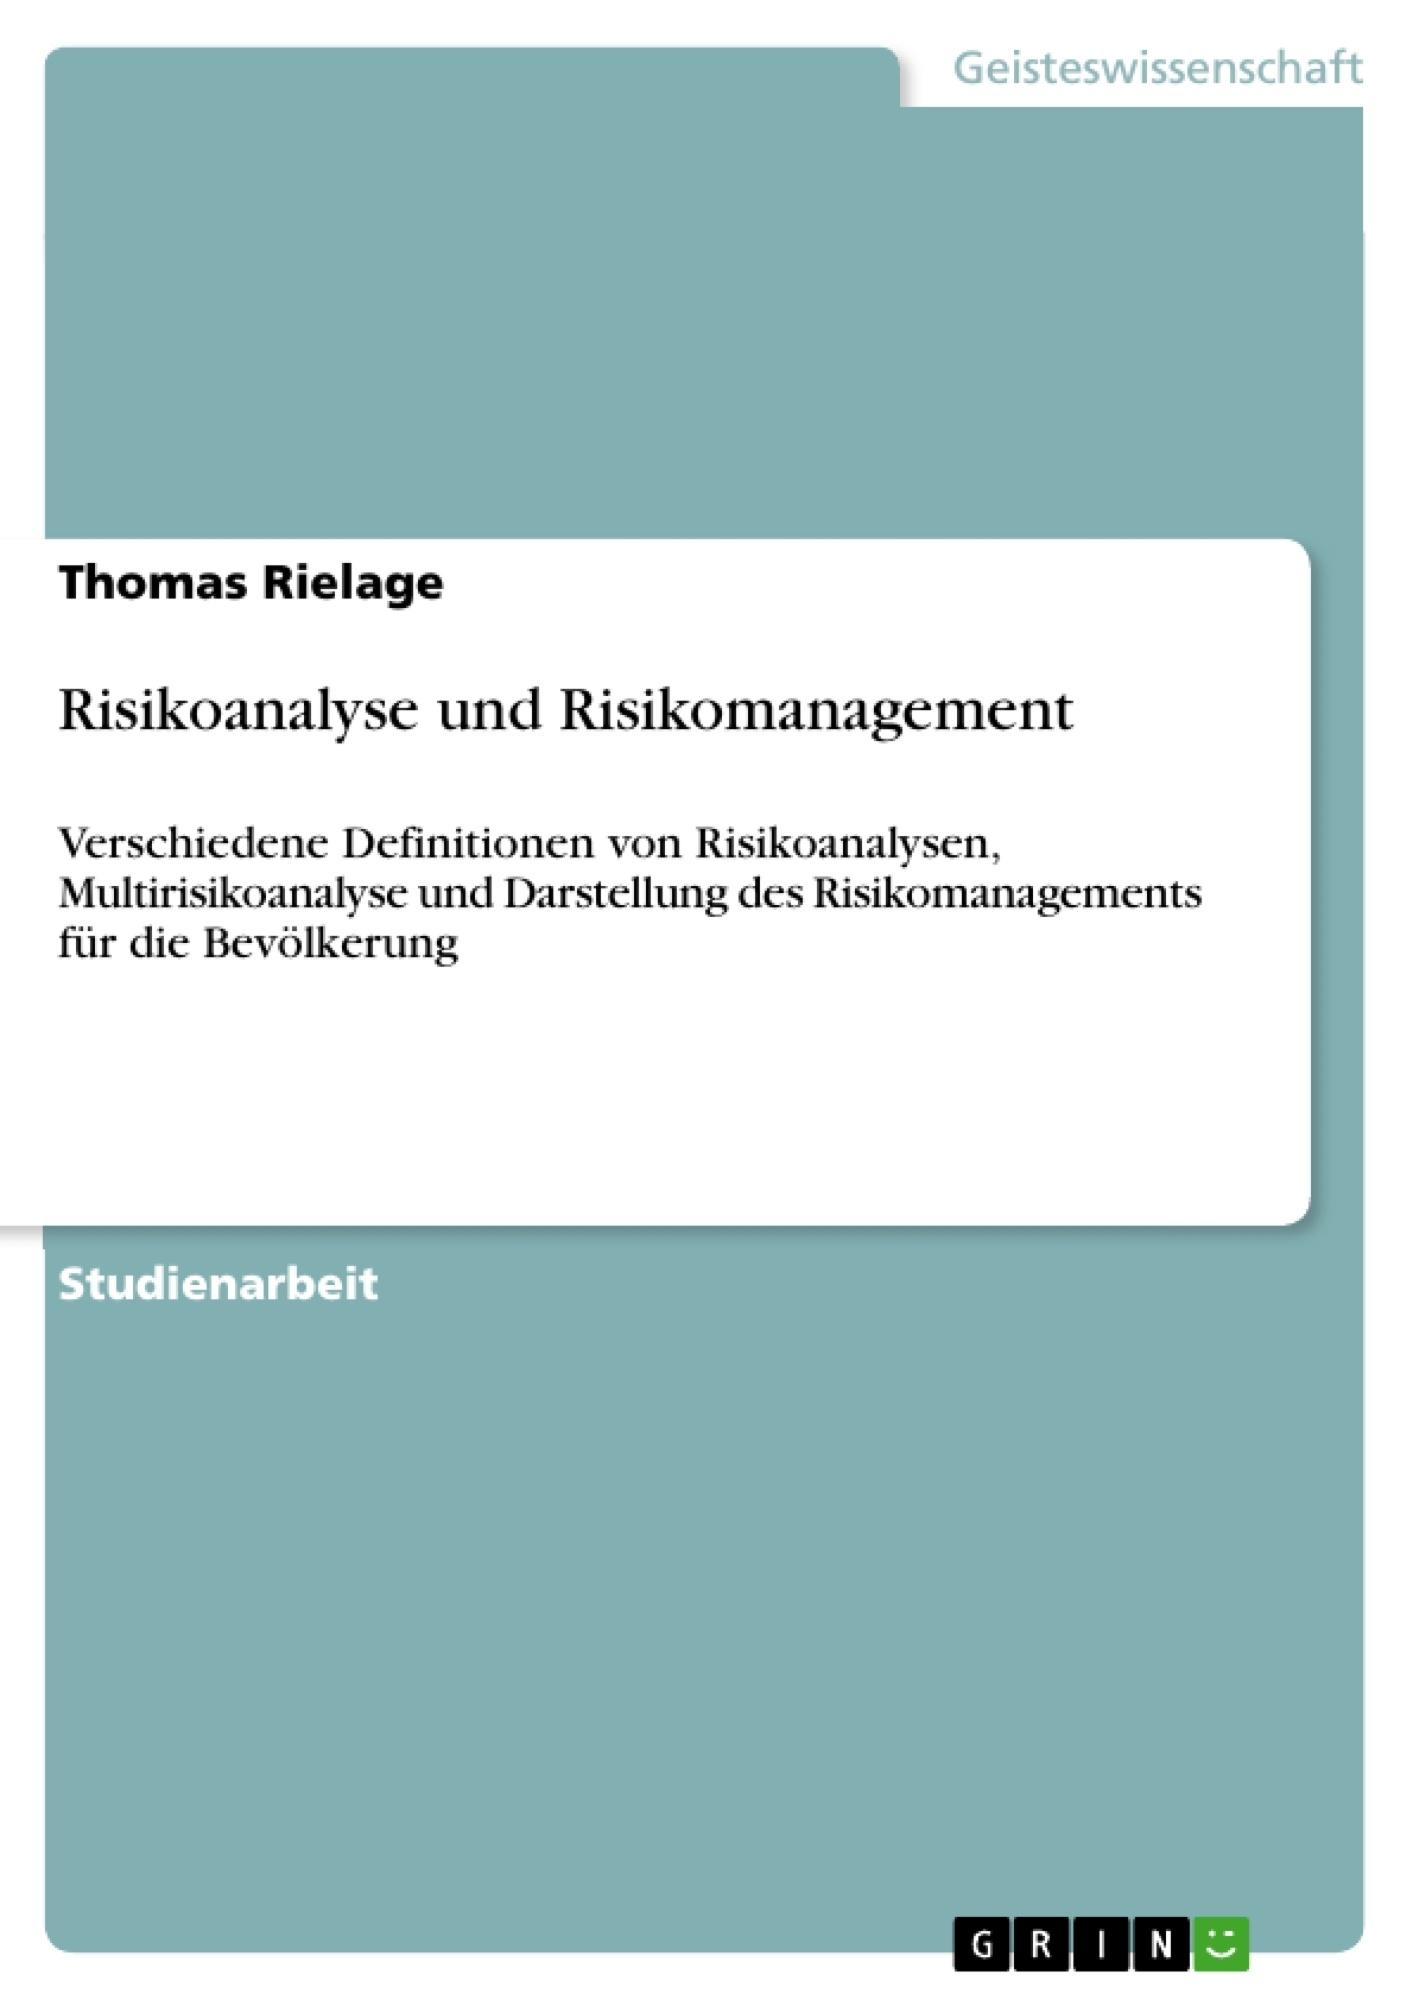 Risikoanalyse und Risikomanagement | Masterarbeit, Hausarbeit ...